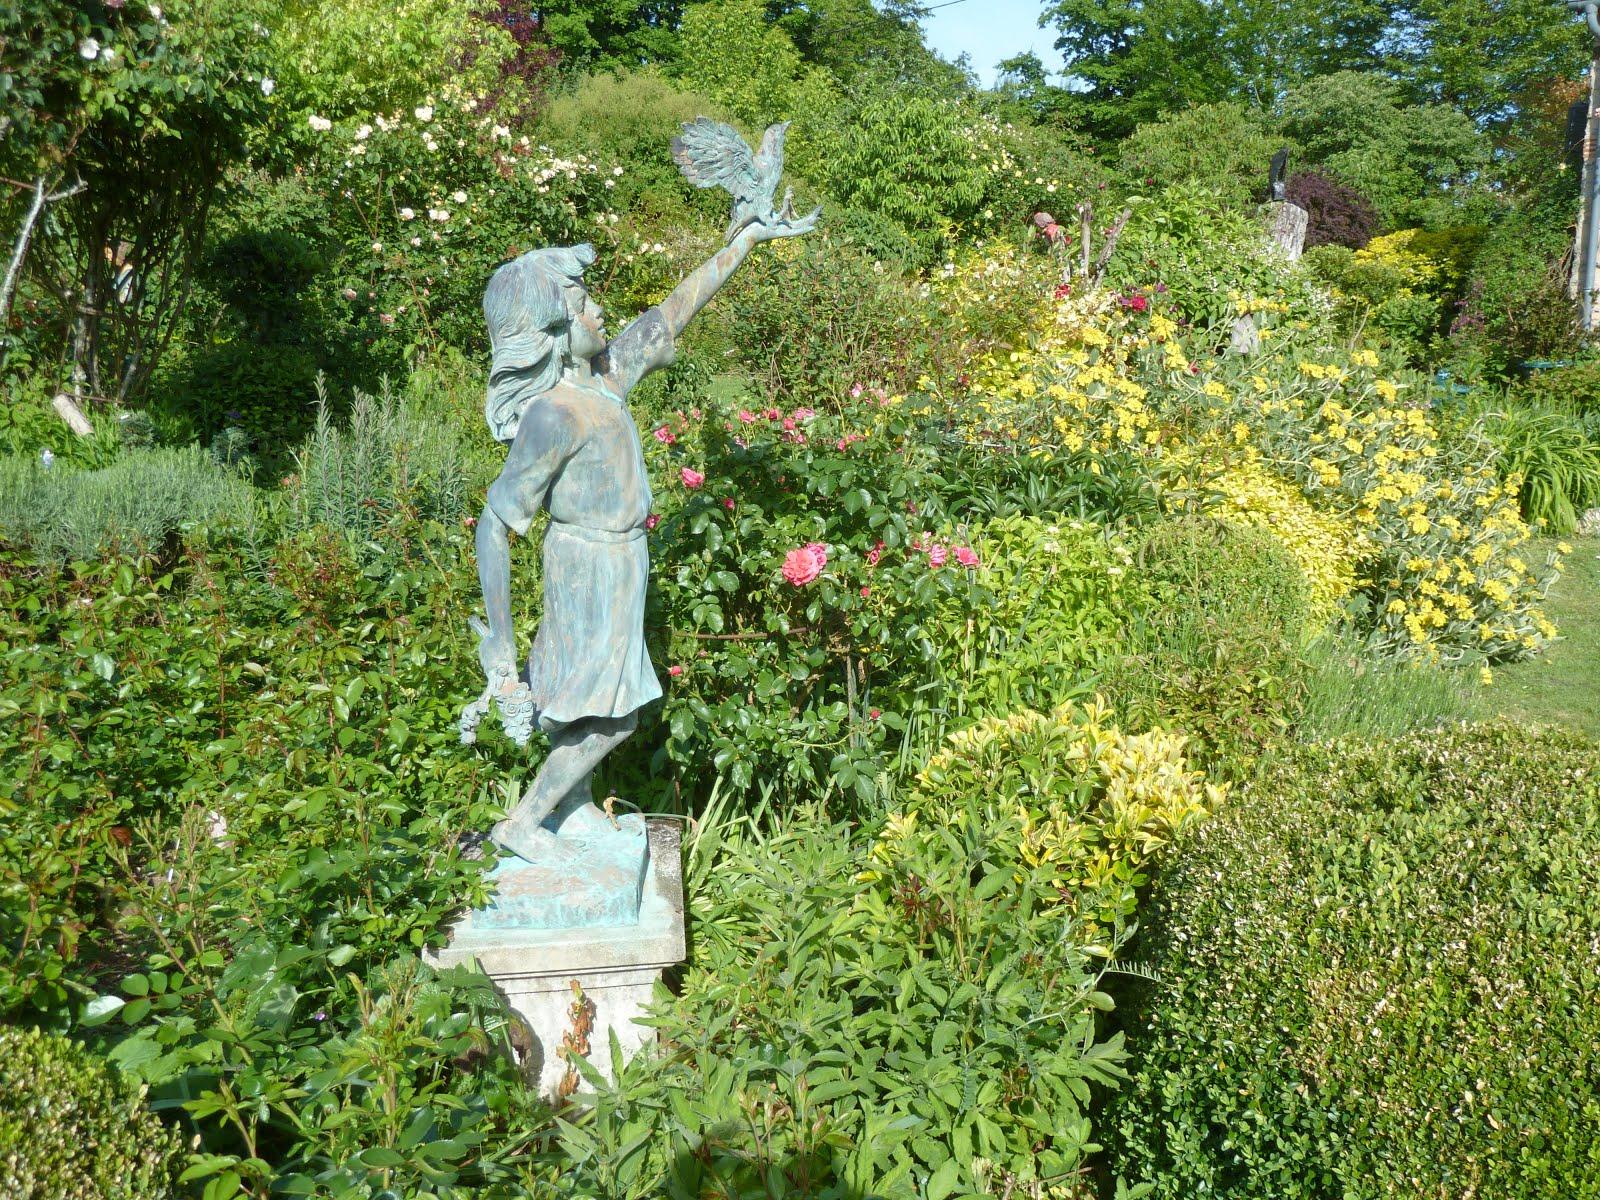 Petite fille en bronze avec l'oiseau